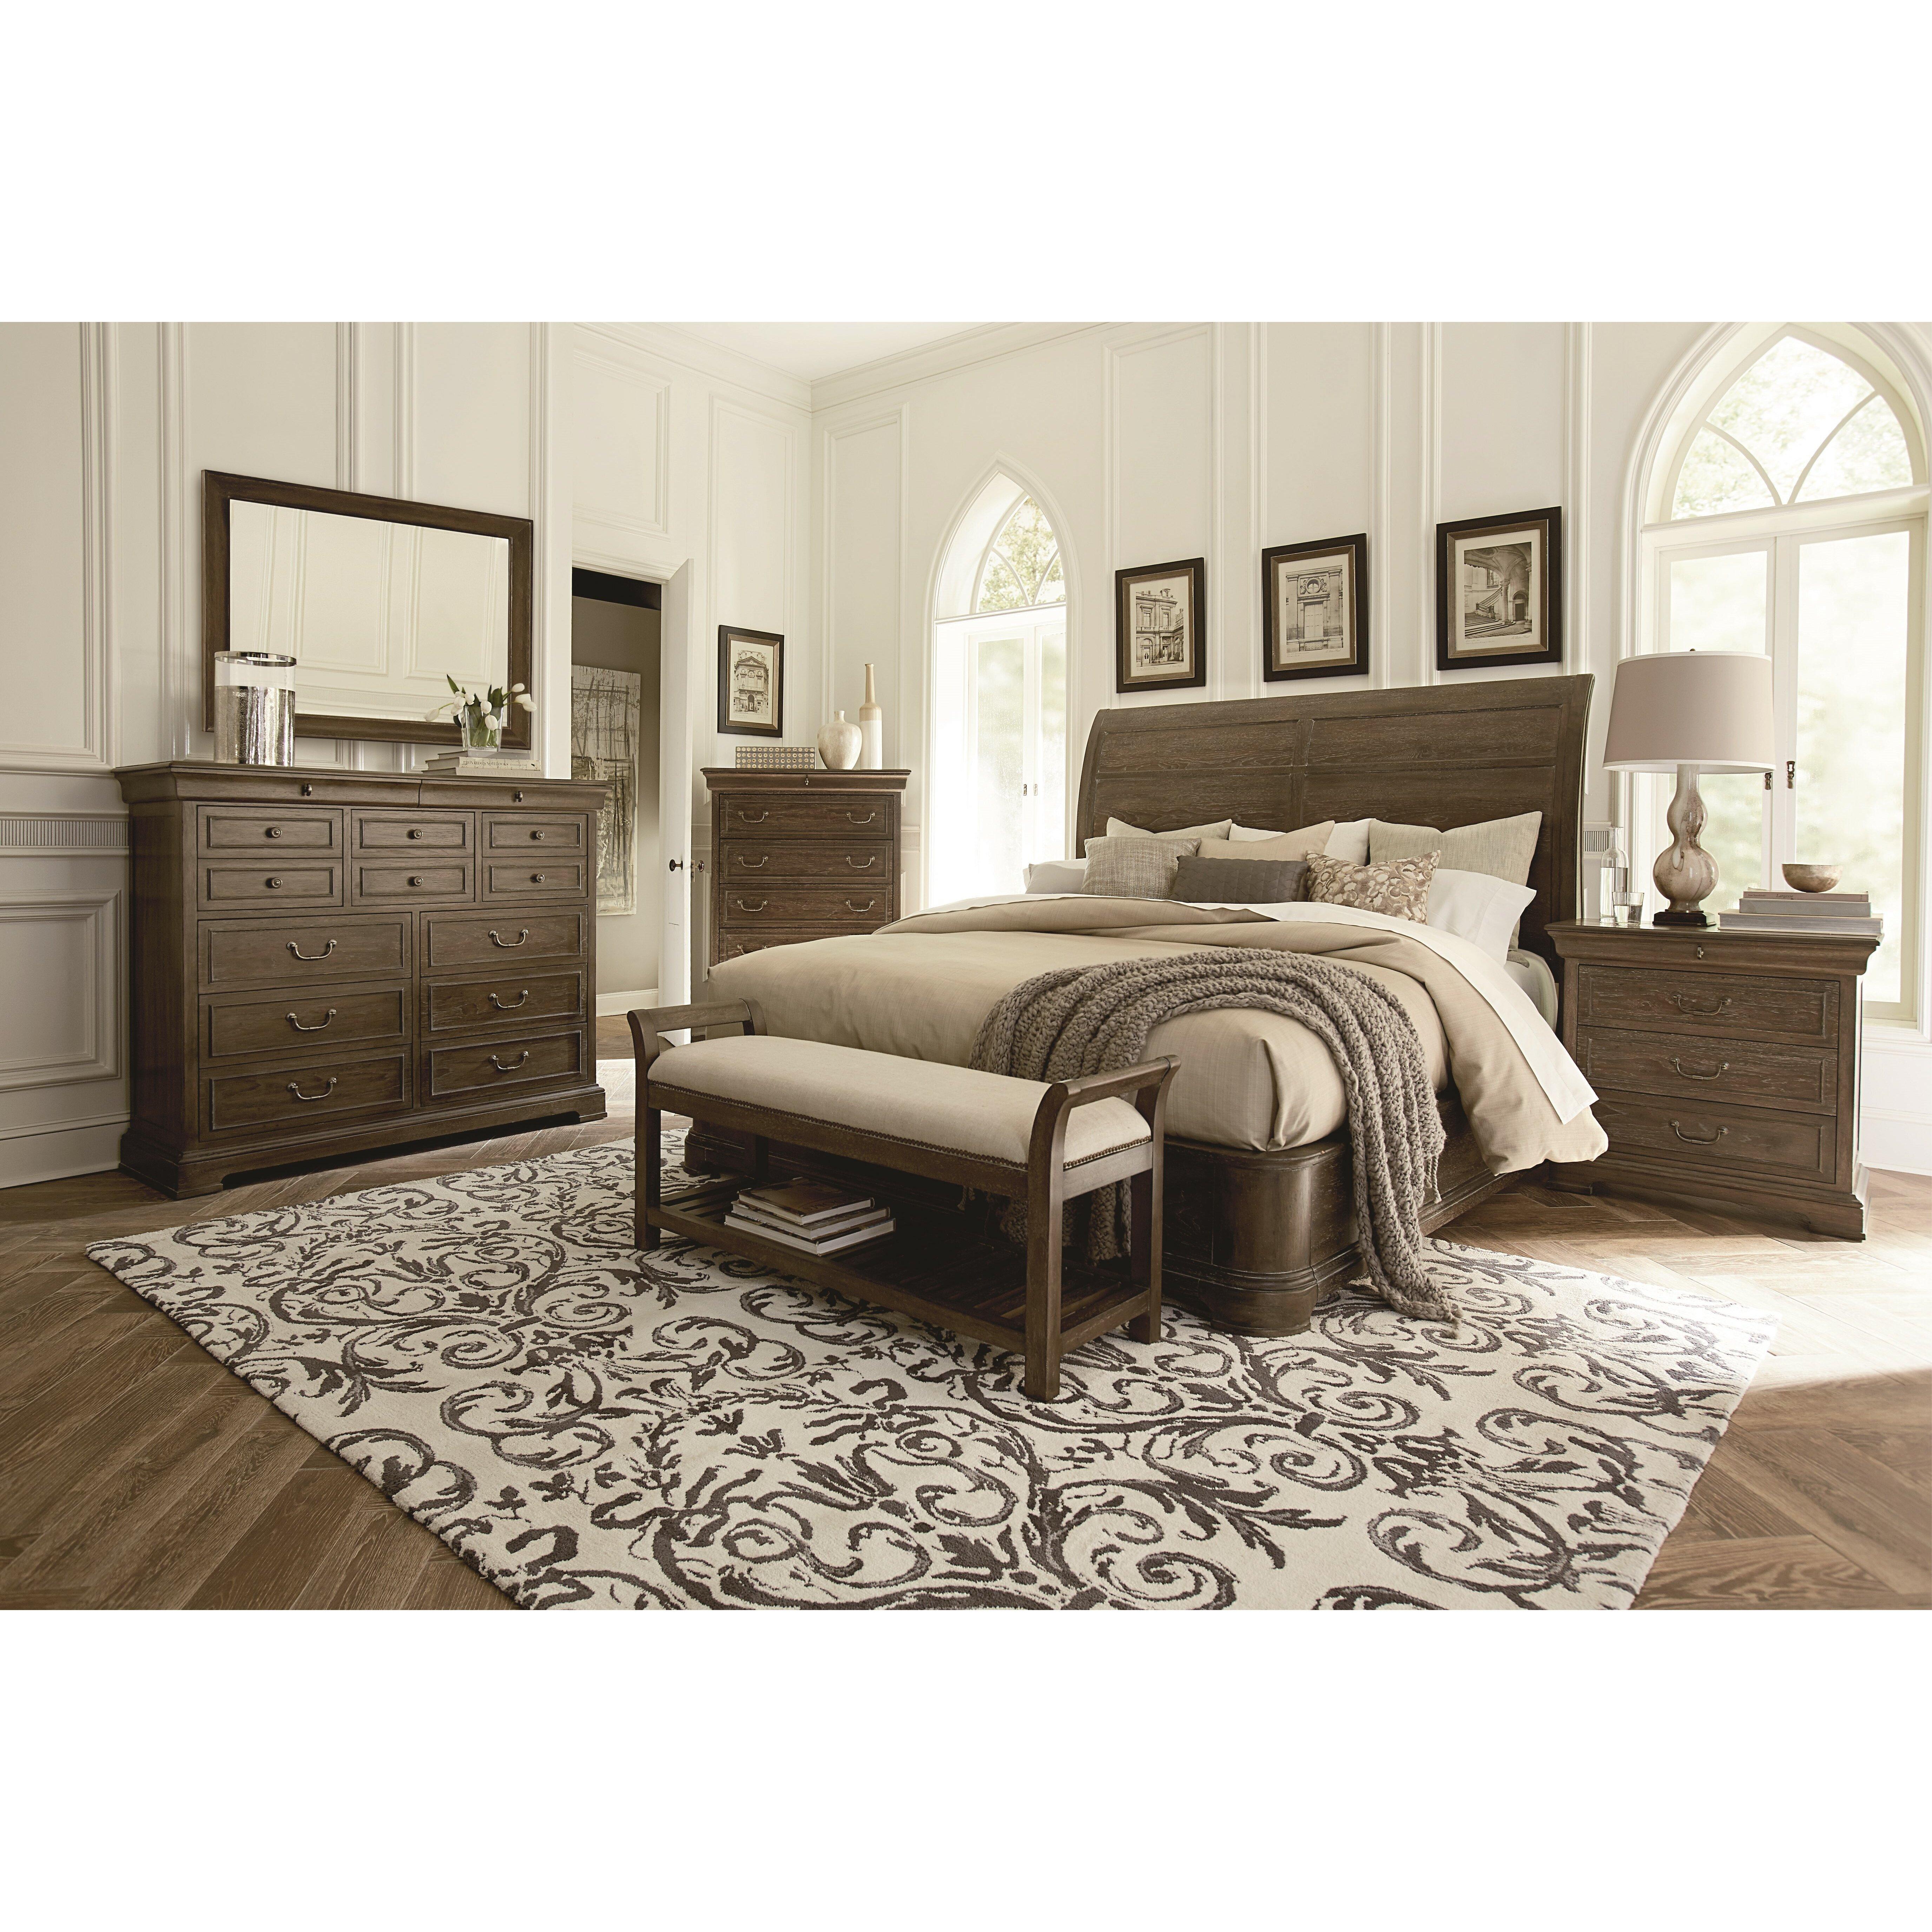 A.R.T. St. Germain Platform Customizable Bedroom Set